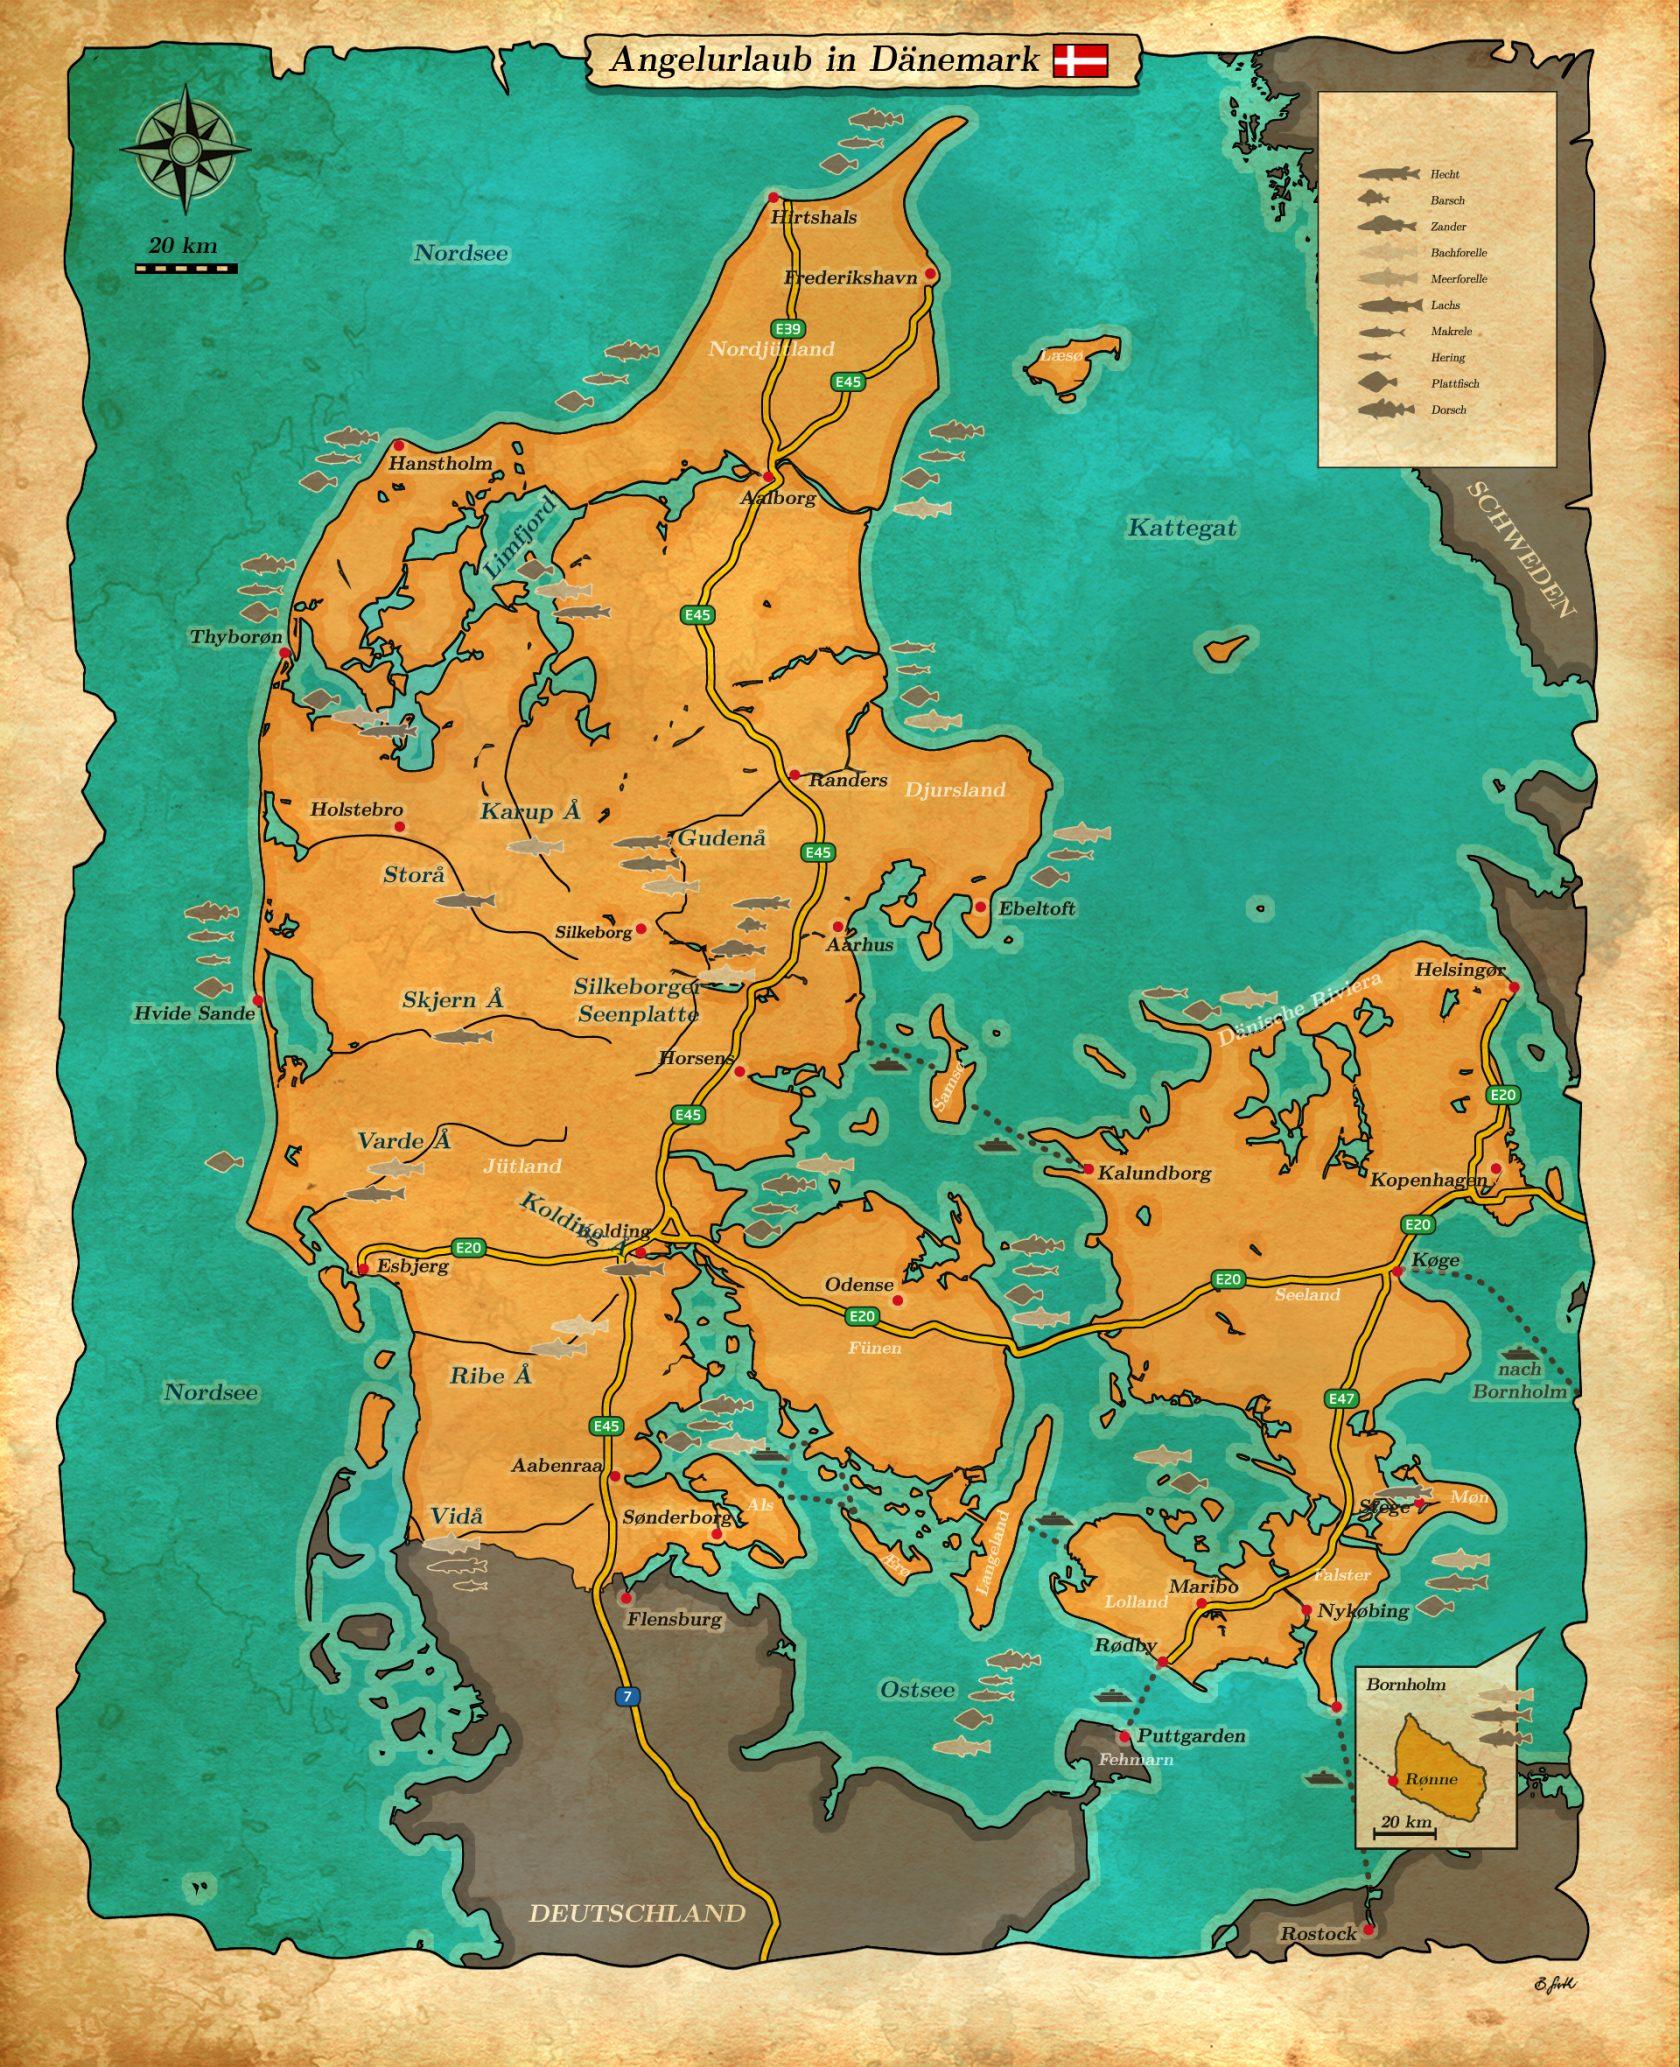 Angelurlaub in Dänemark Karte